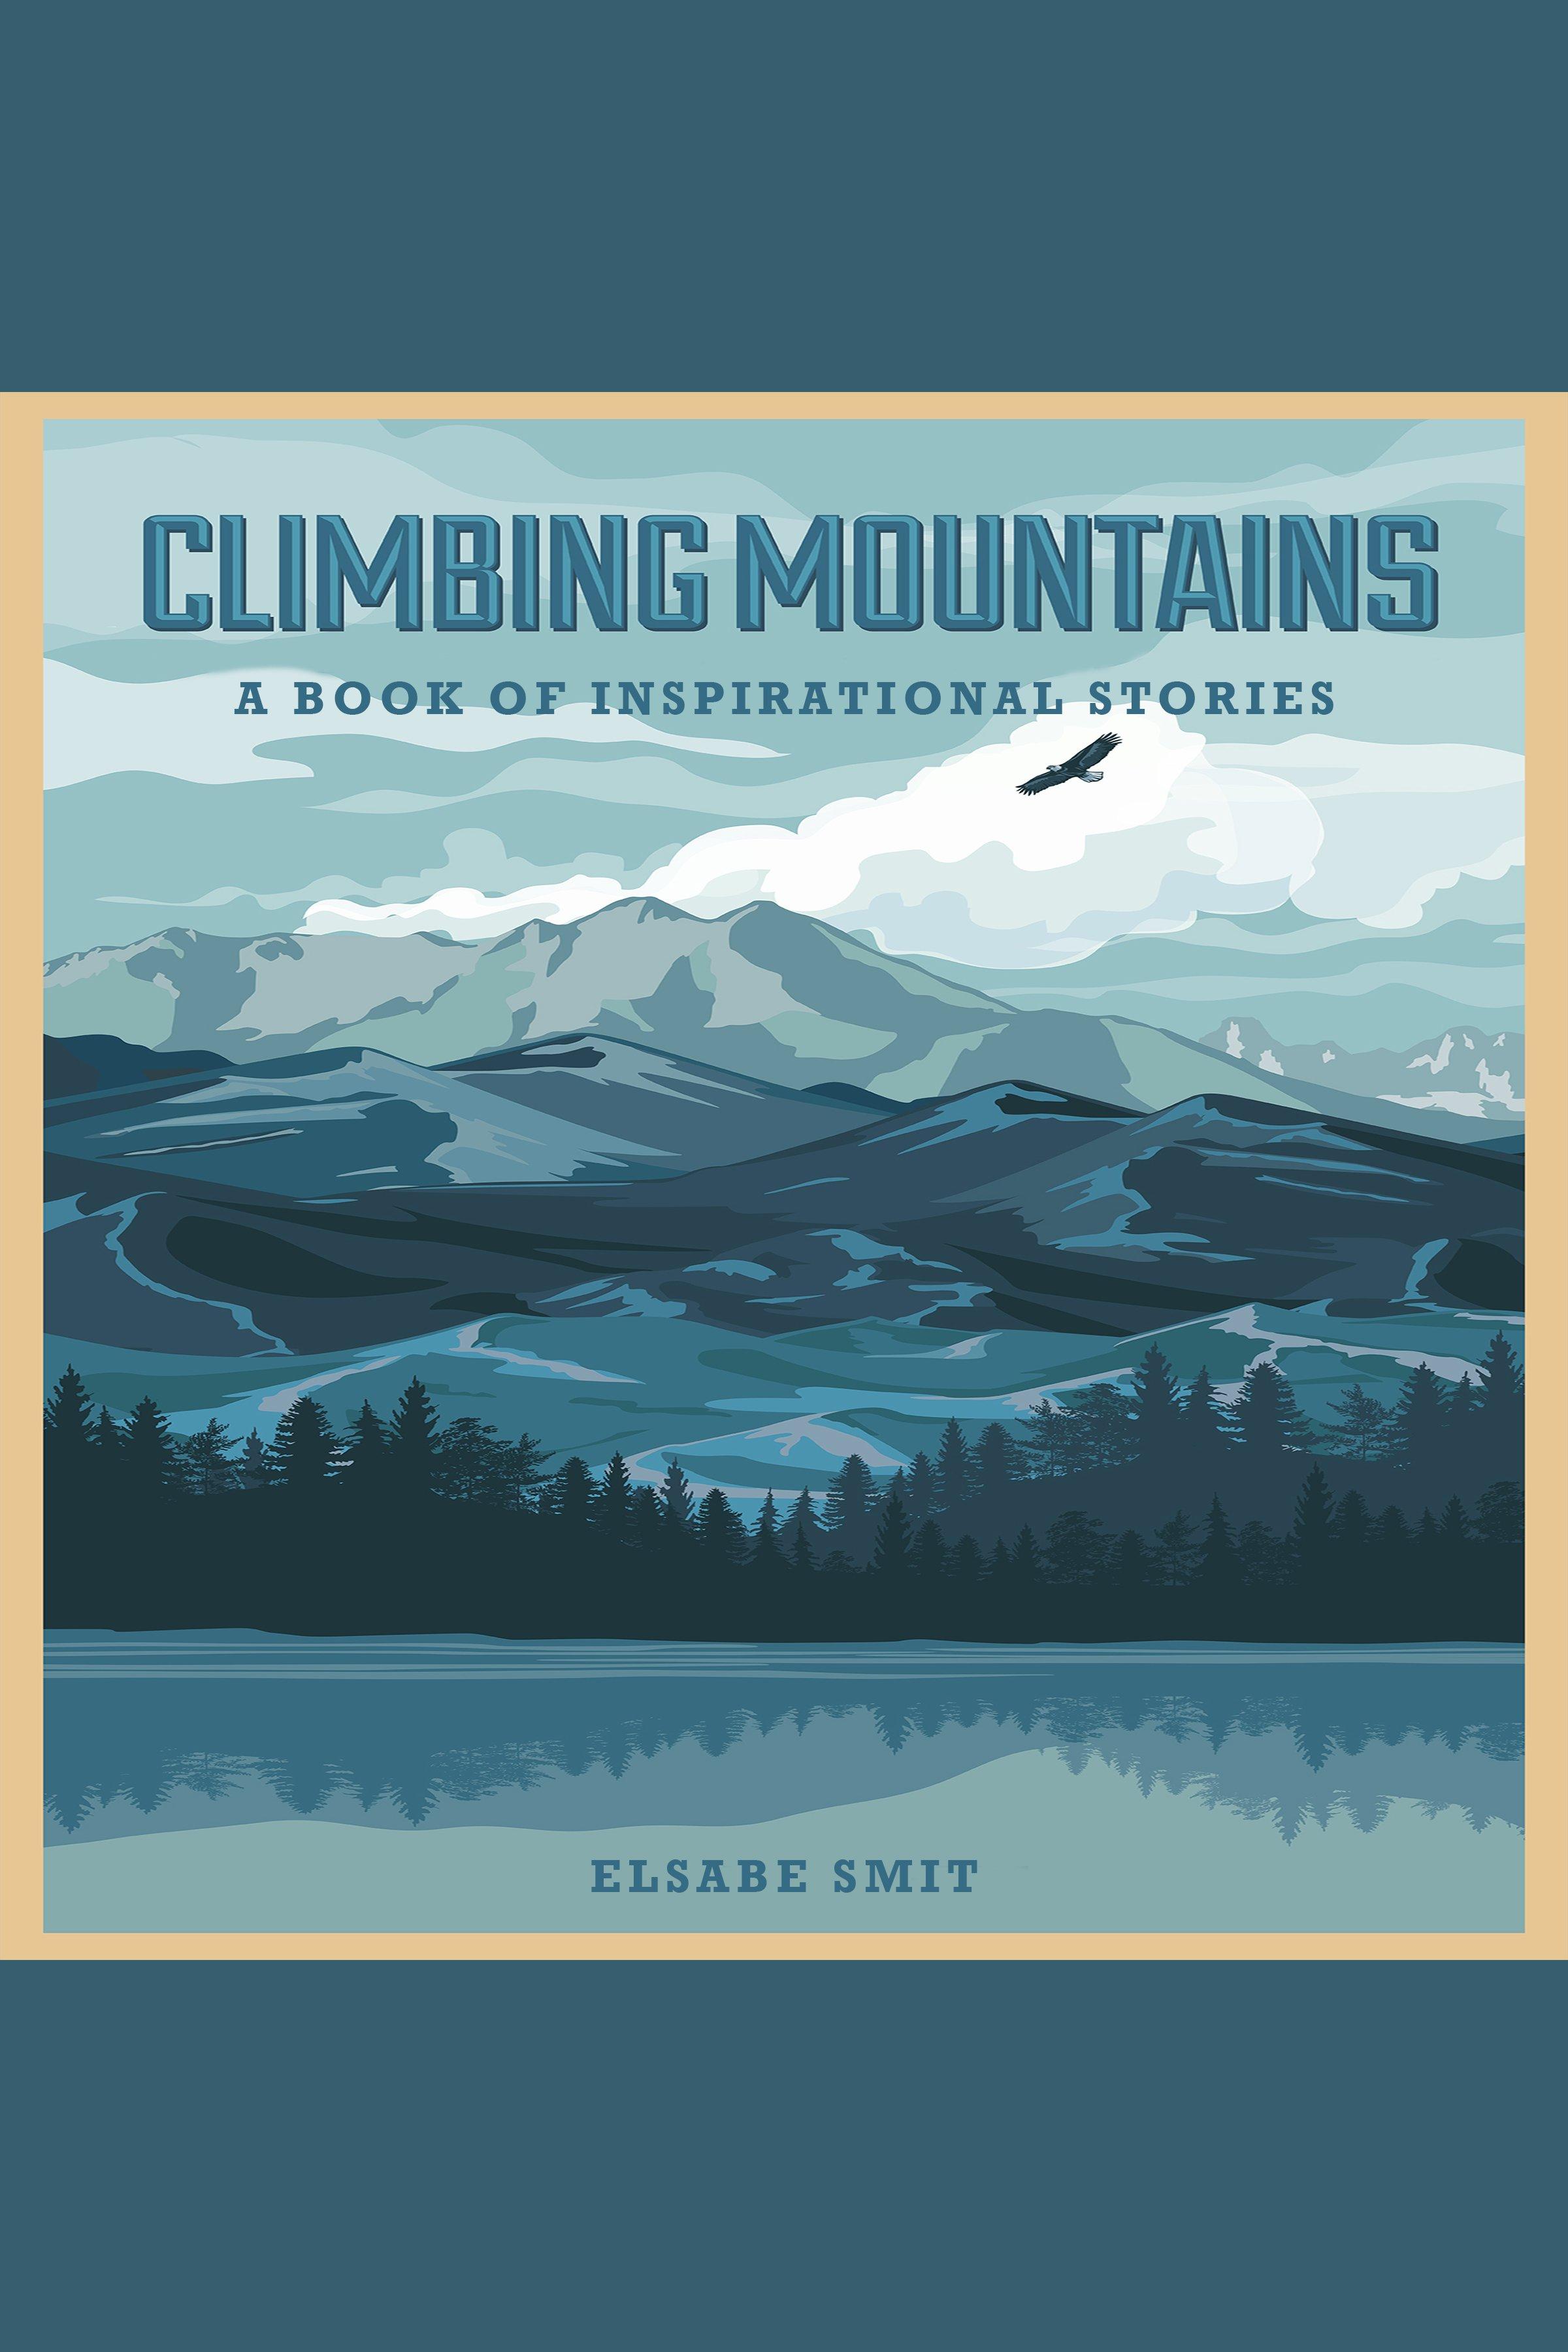 Climbing Mountains: A Book of Inspirational Stories